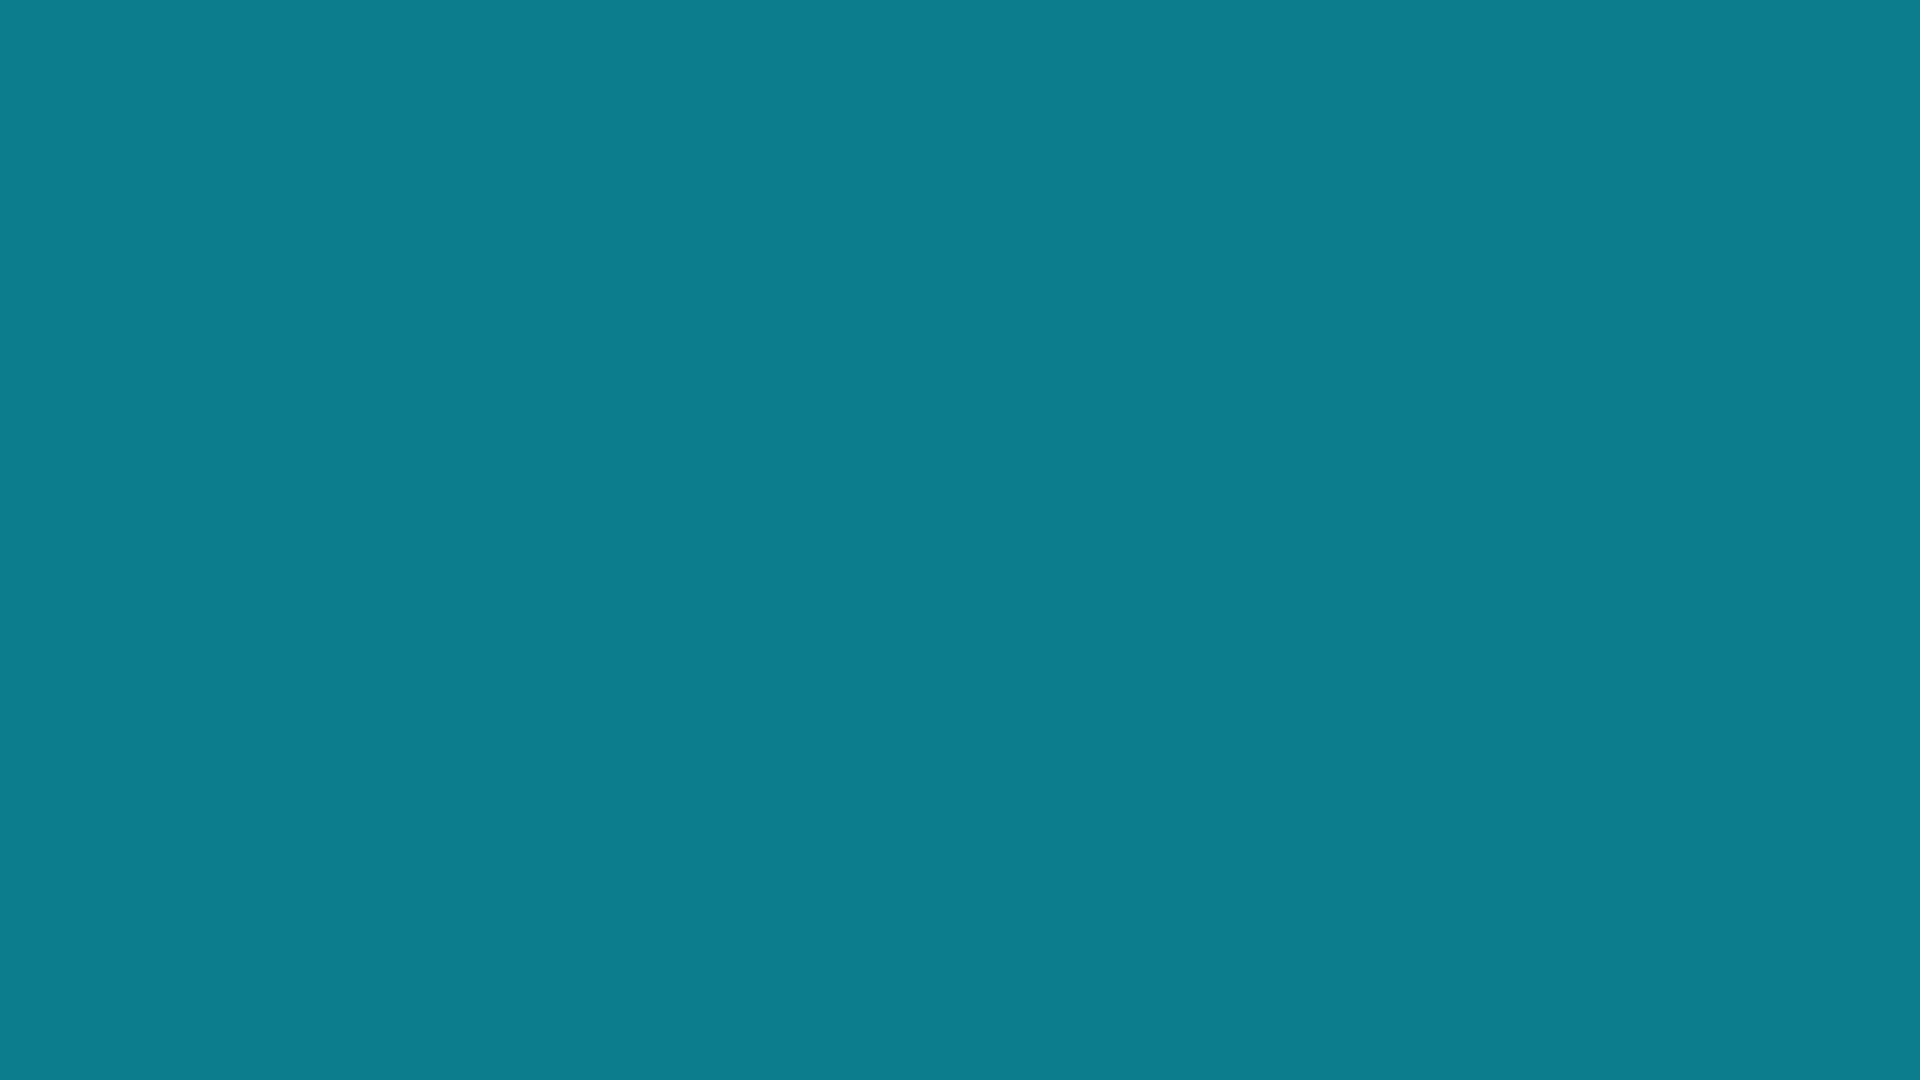 1920x1080 Metallic Seaweed Solid Color Background